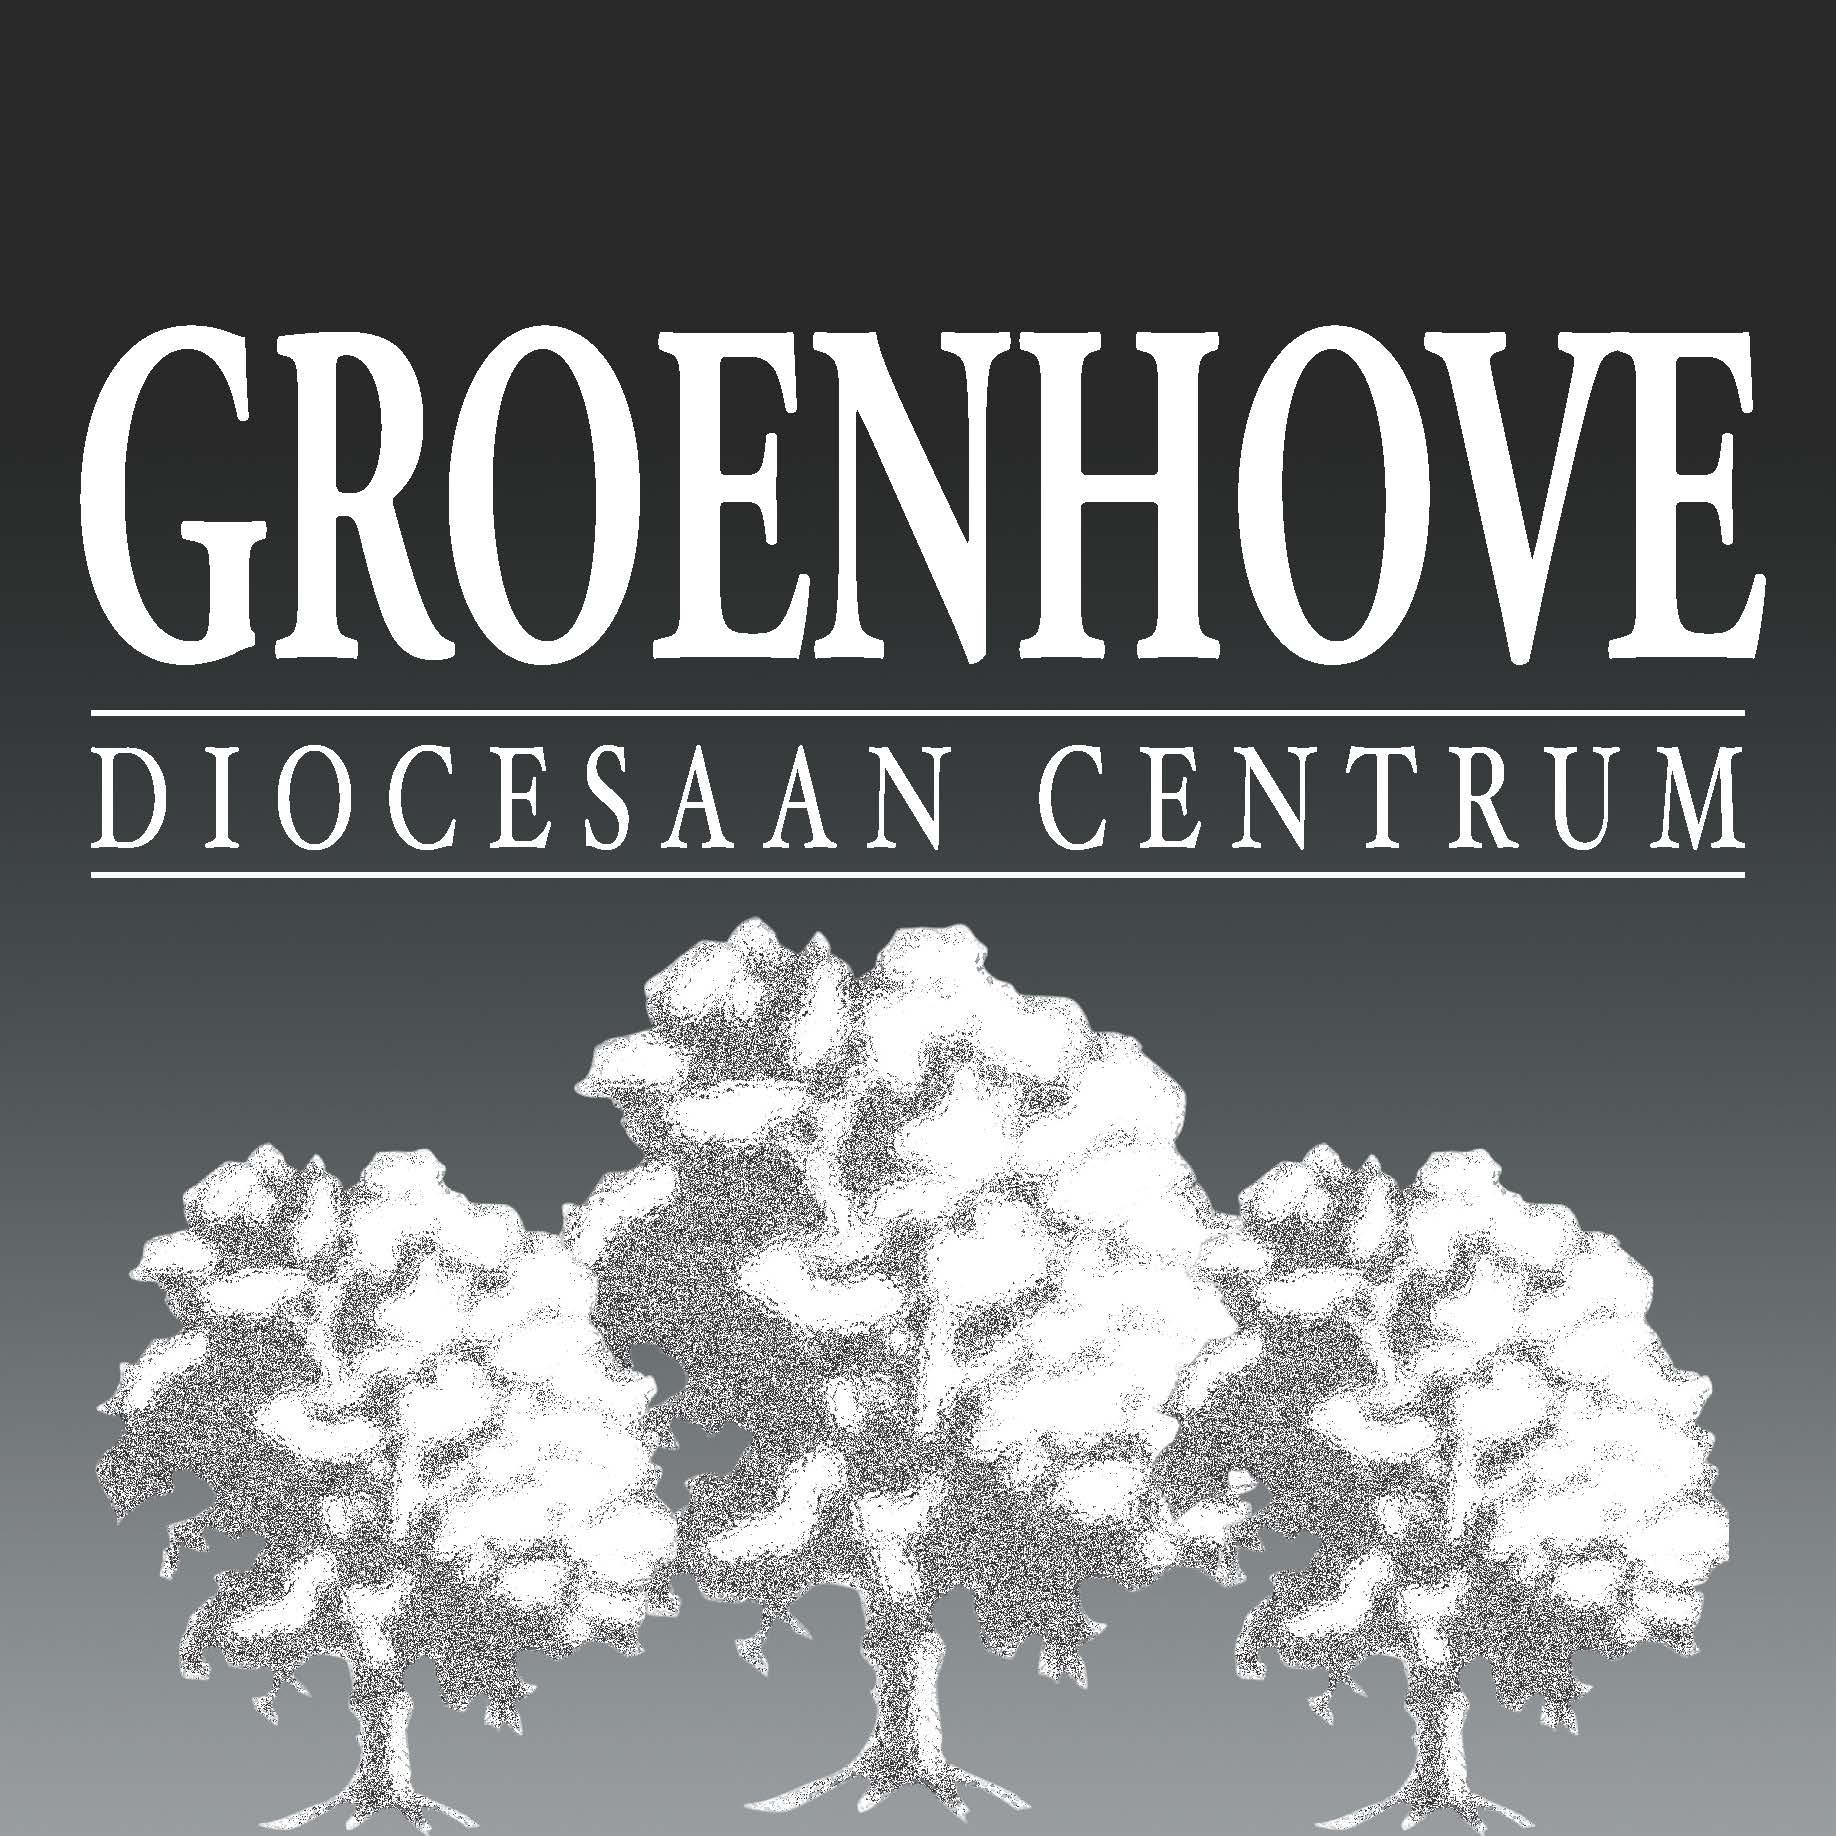 groenhoeve-logo-bis